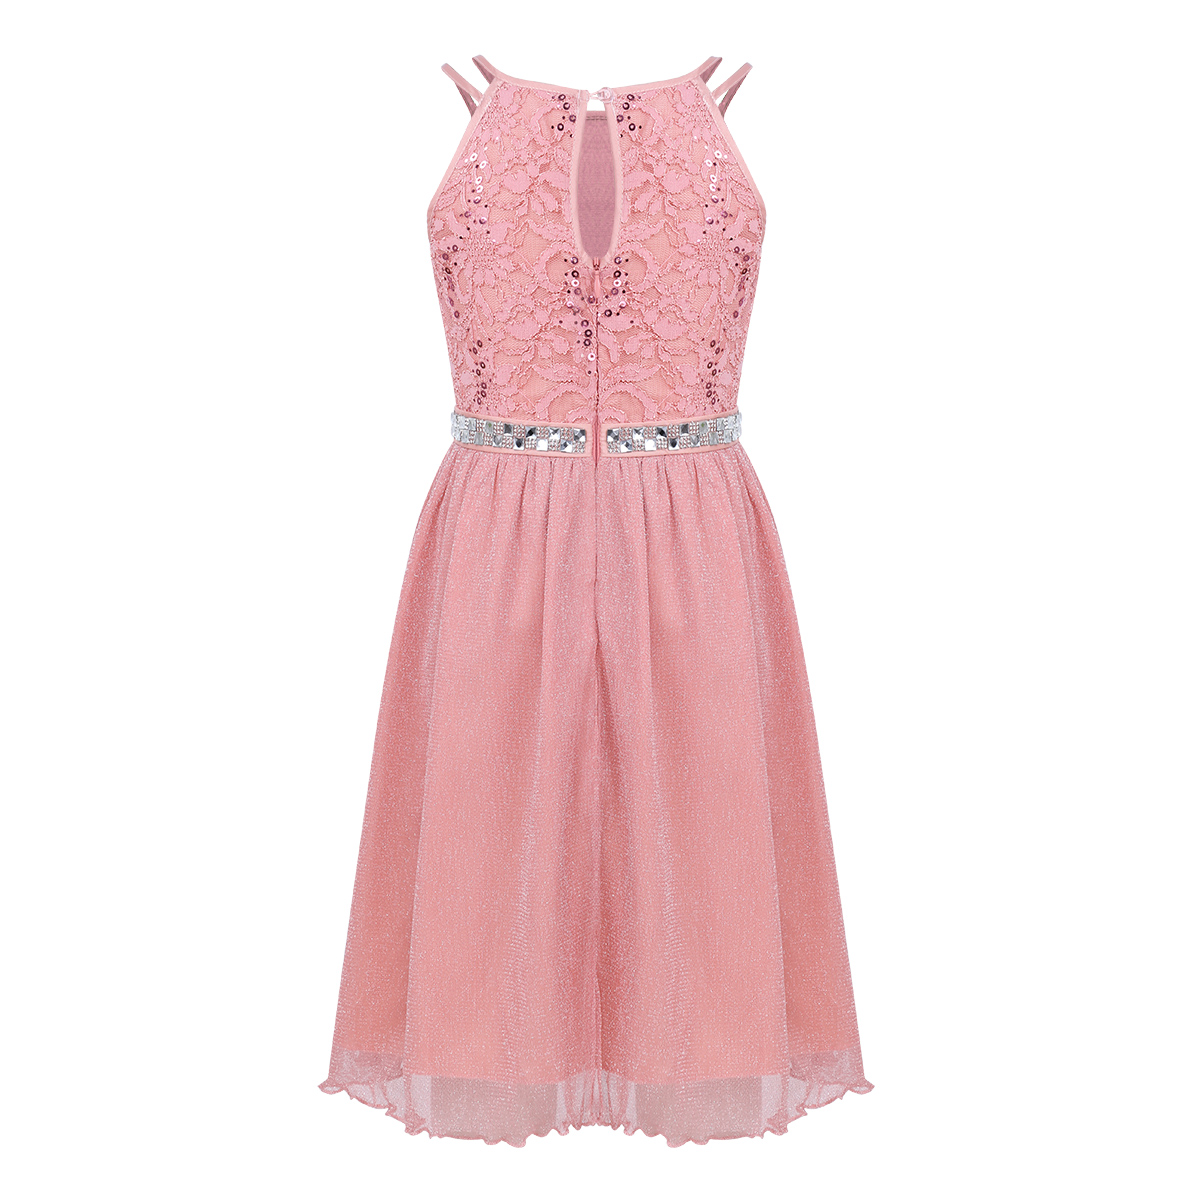 iiniim Teen Girls Sleeveless Sequined Floral Lace Shiny Dress Vestido de festa for Weeding Formal Birthday Party Summer Dresses 3